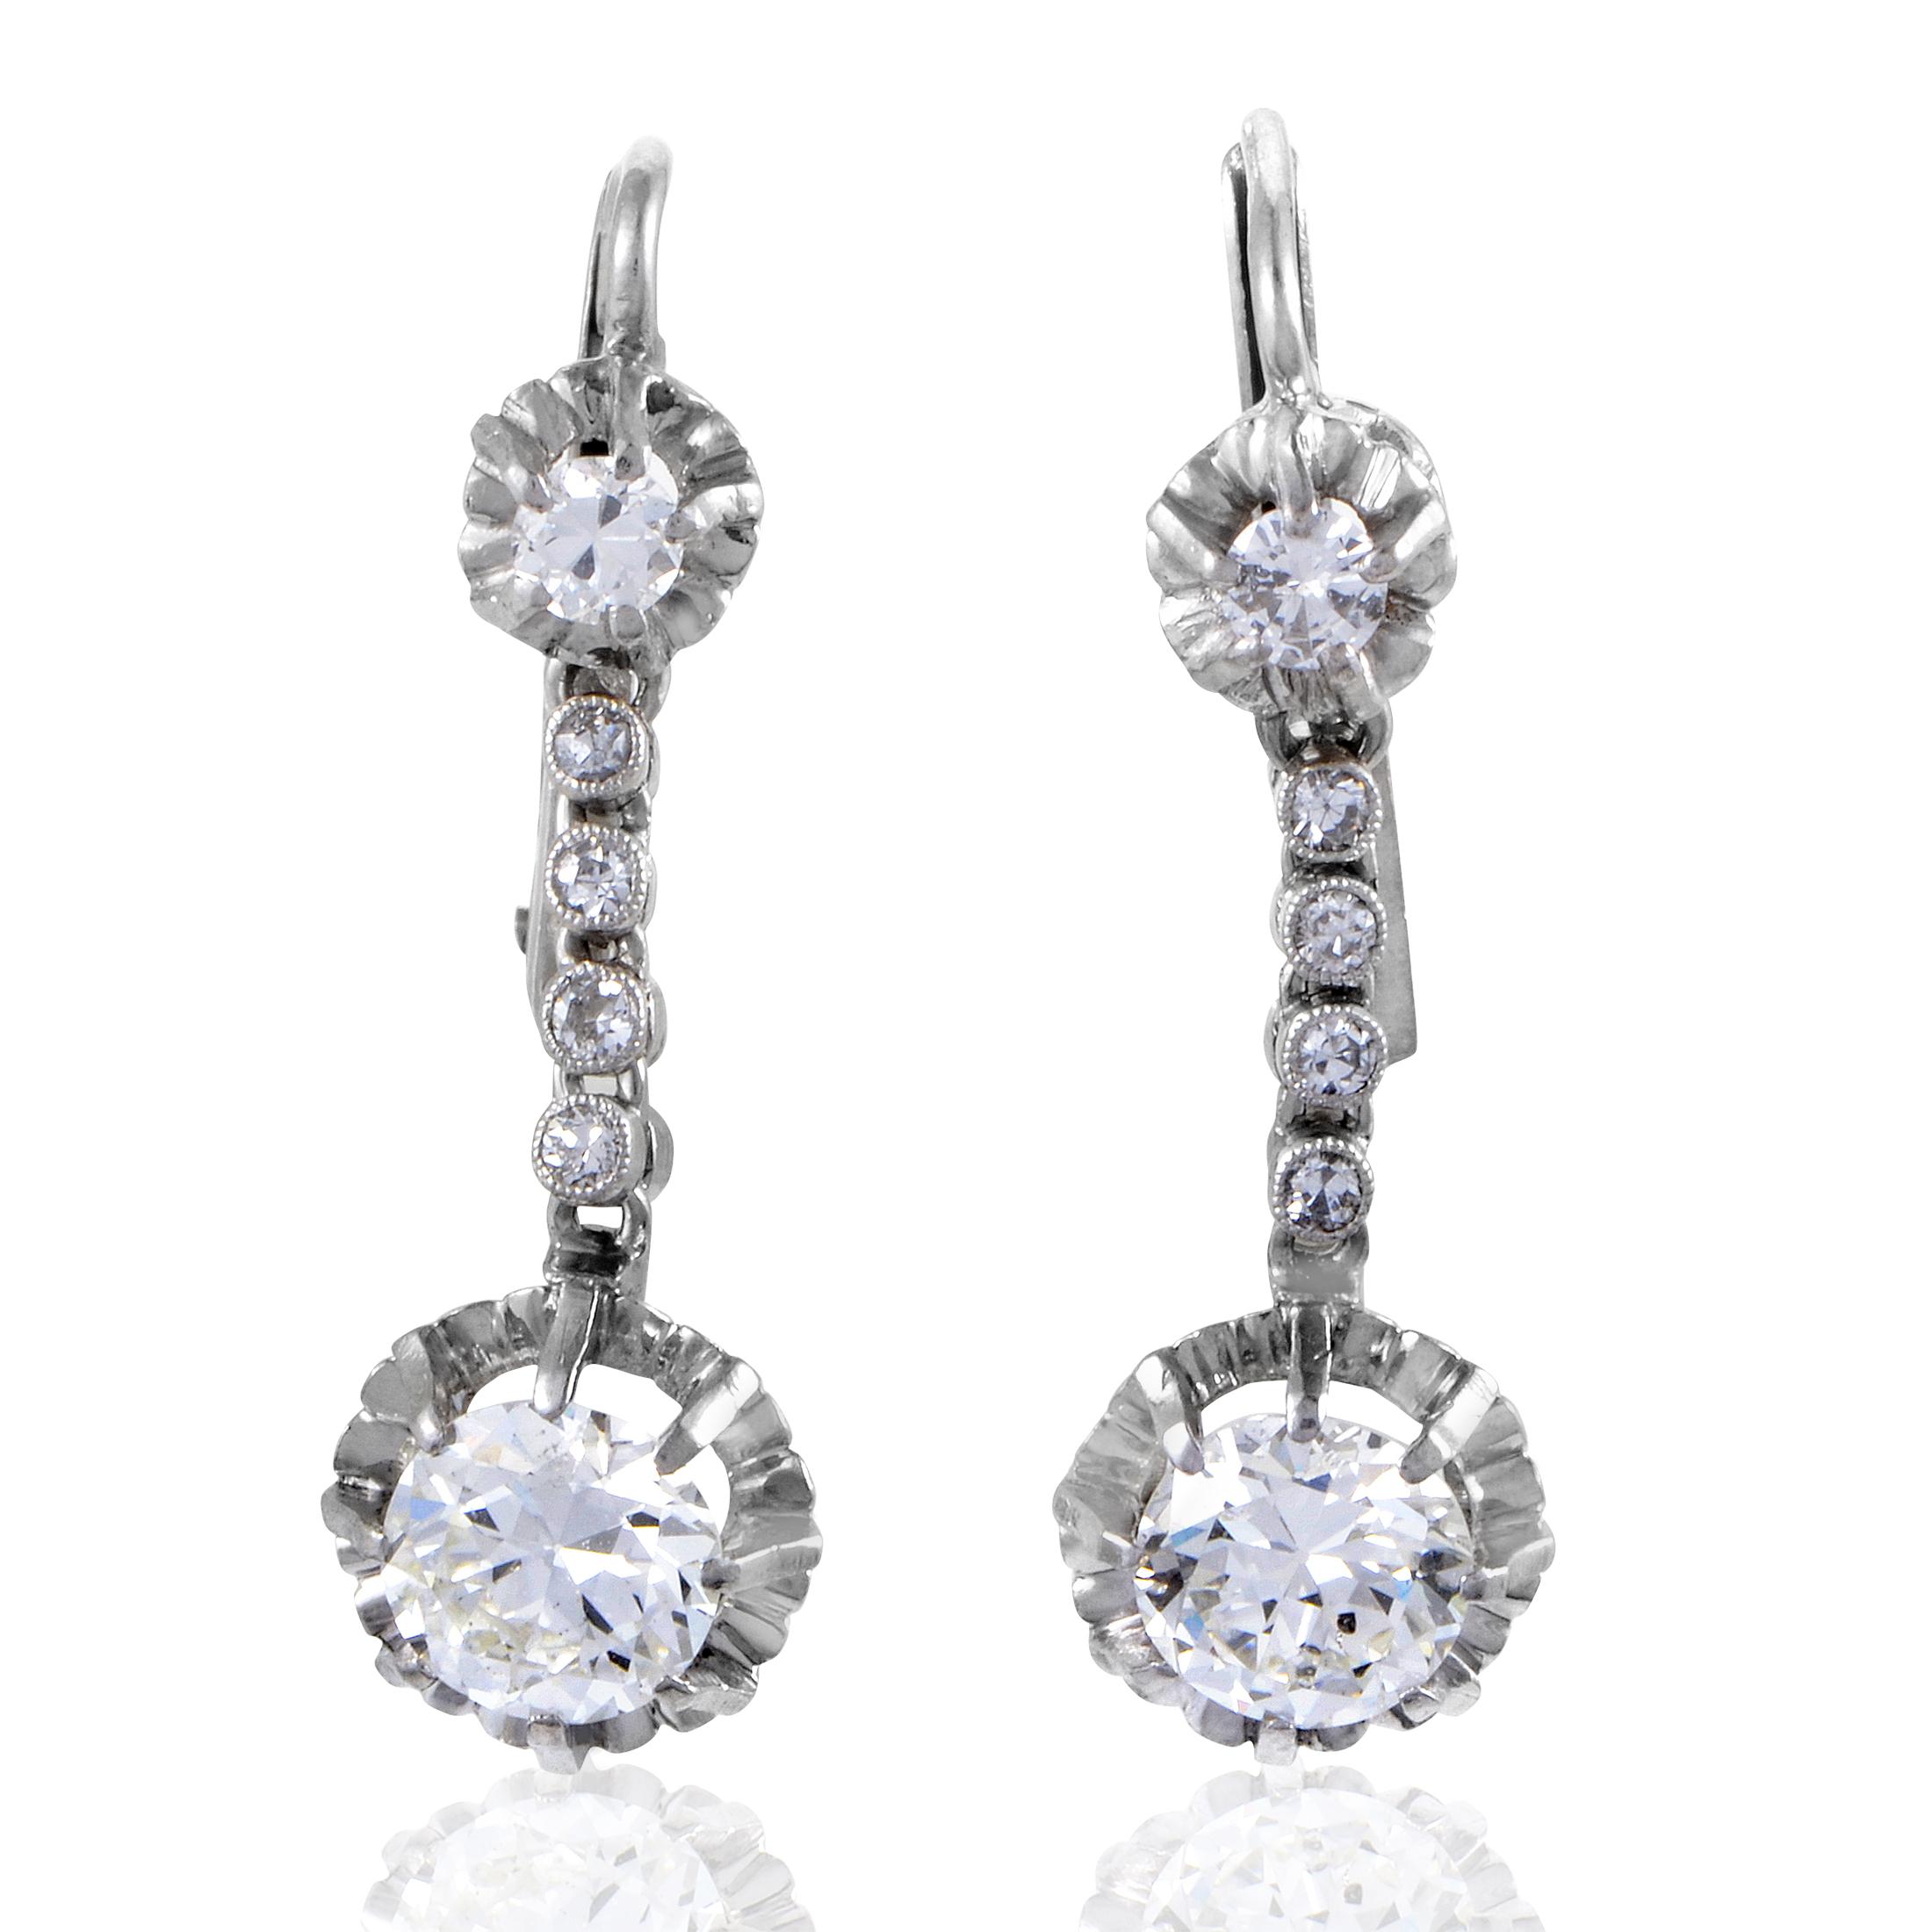 Women's Antique Platinum Diamond Dangle Earrings Md0107753ab. Single Pearl Pendant. Platinum Wedding Rings. Intertwined Engagement Rings. Bulk Crystal Beads. Thick Diamond Band. Chain Medallion. Artisan Bracelet. Sapphire Lockets